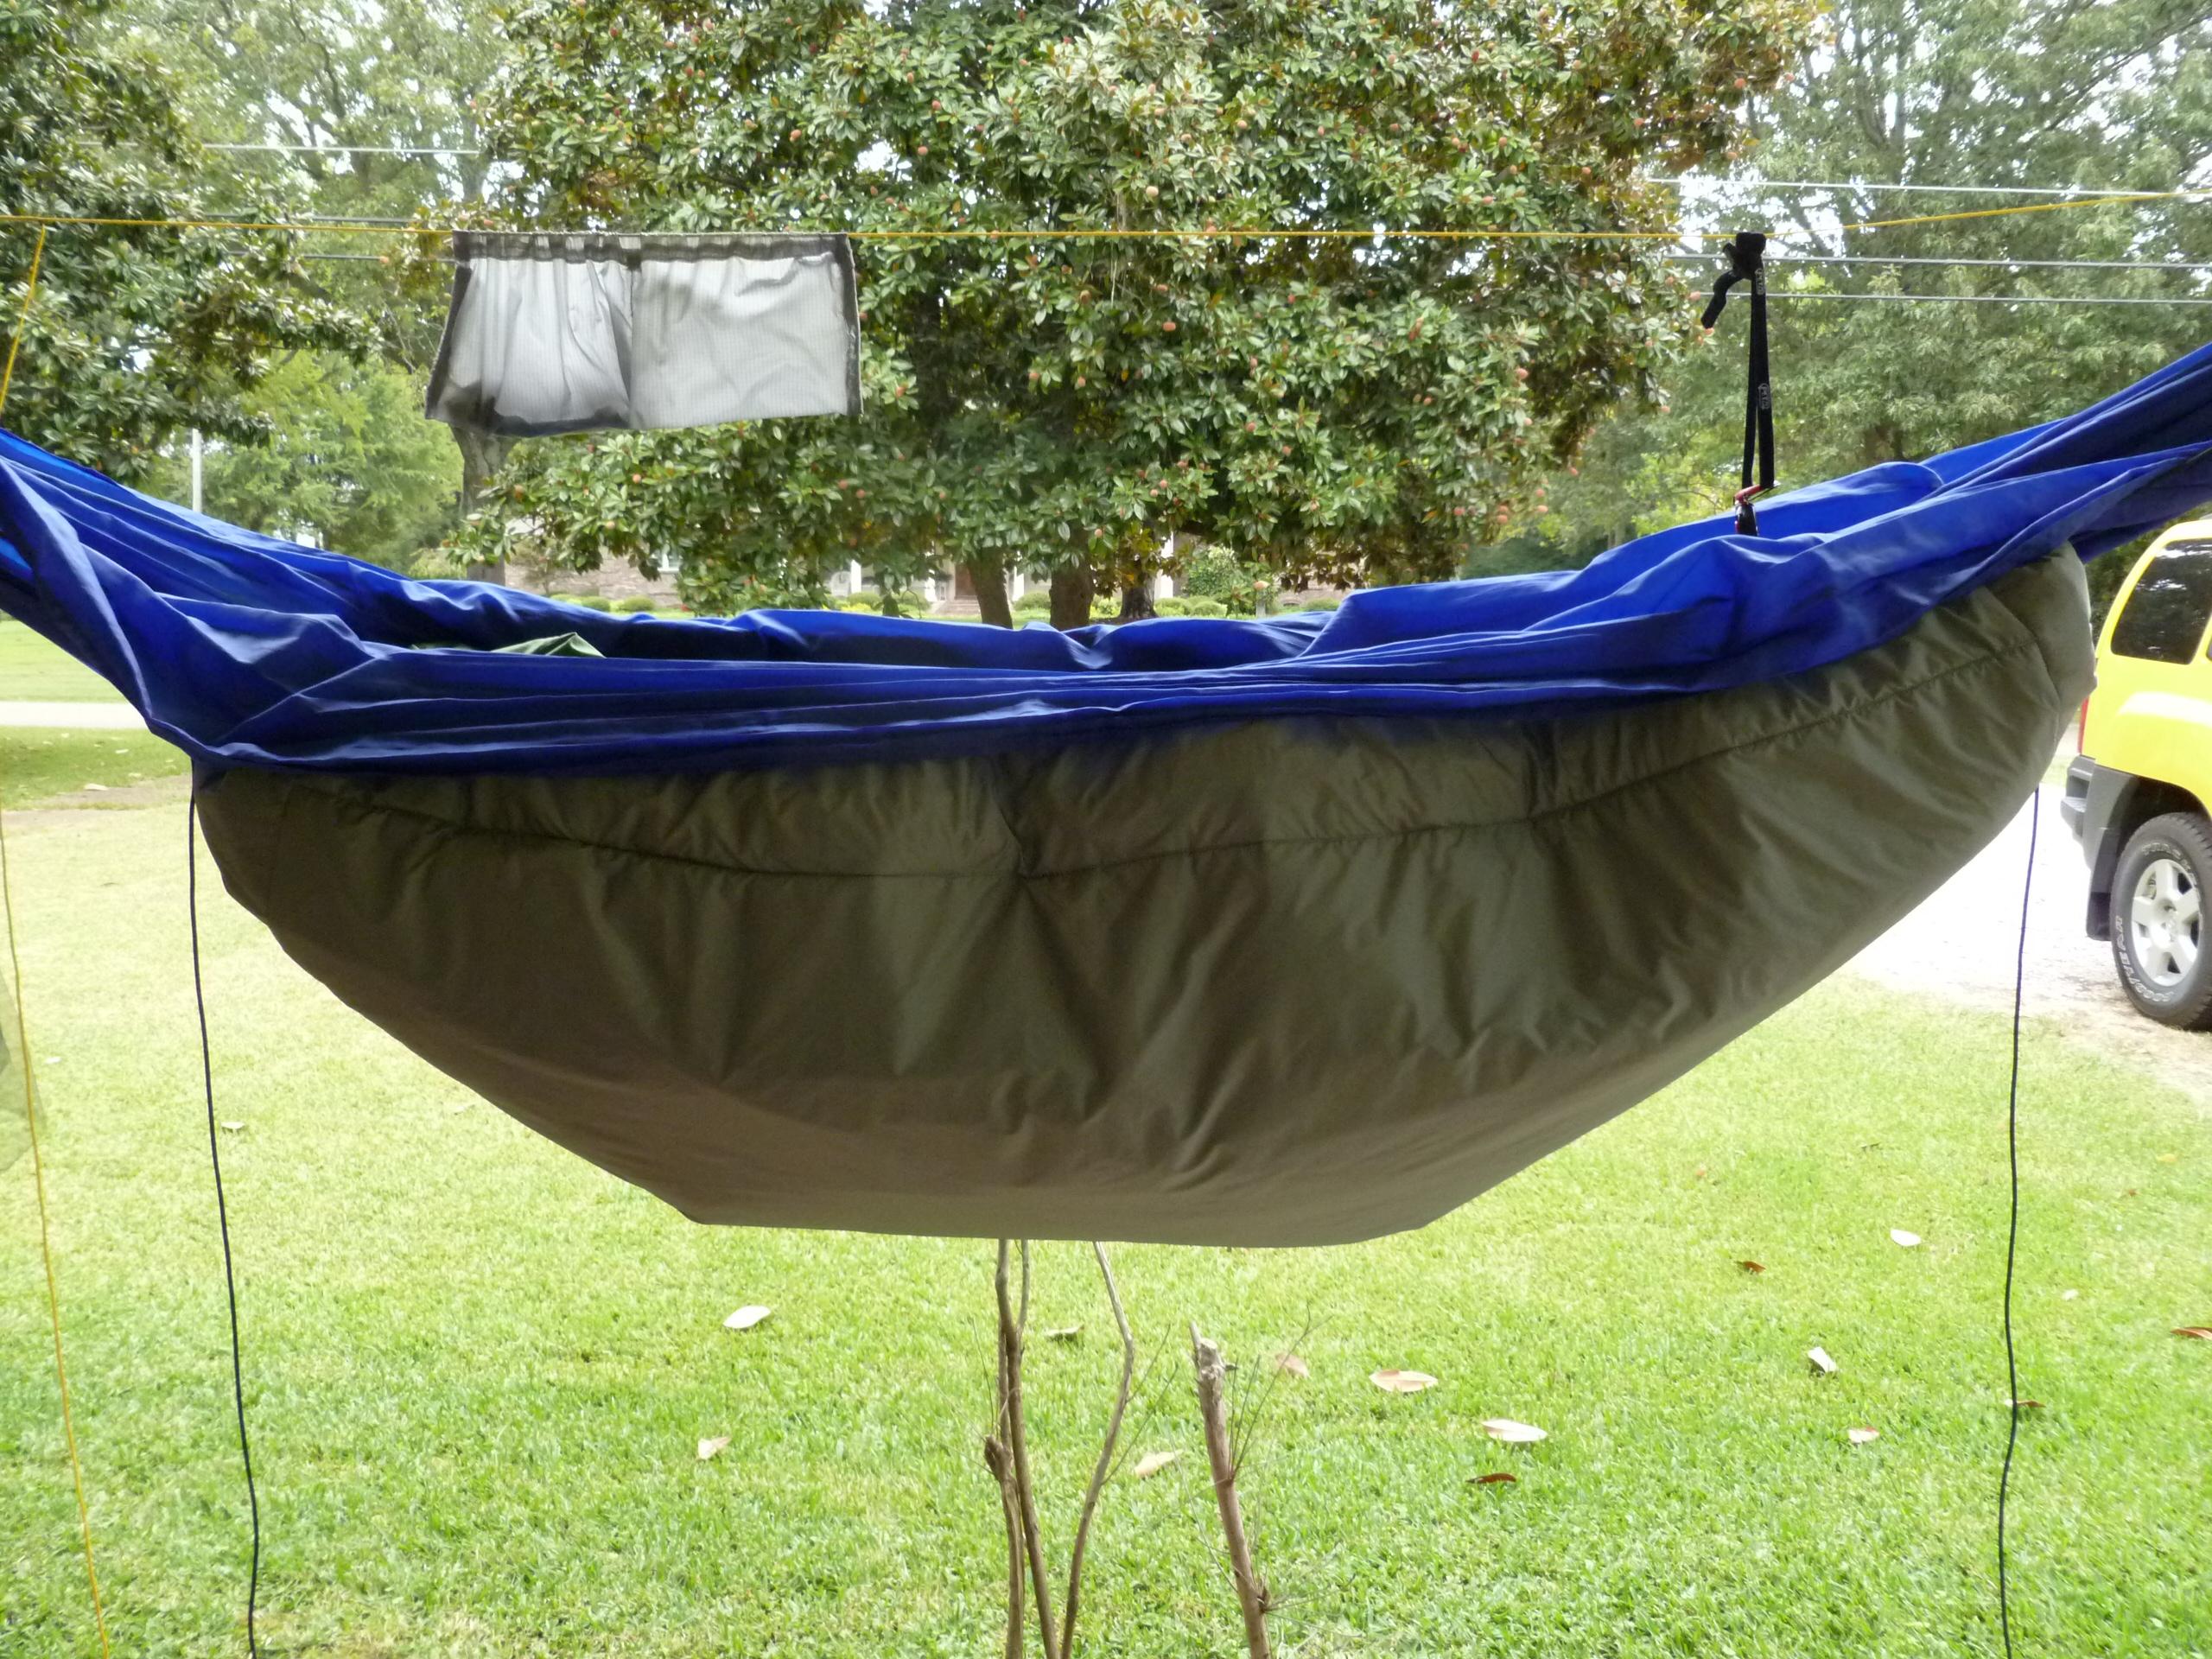 diy uq  aka  do it yourself underquilt  newly designed hammock gear 20 f phoenix under quilt   stick u0027s blog  rh   sticksblog